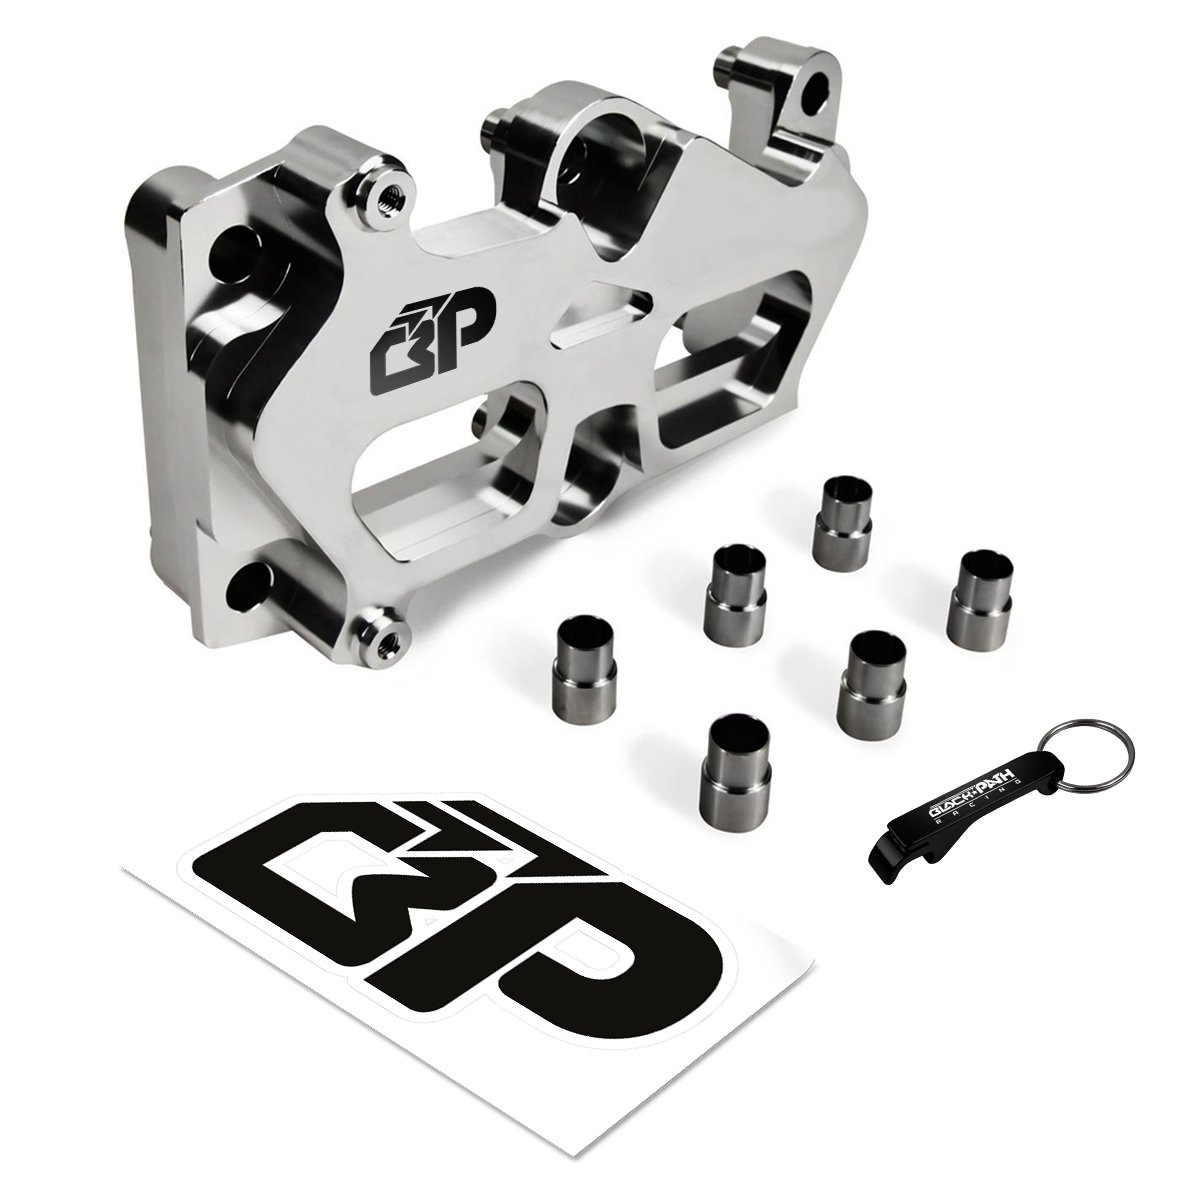 BlackPath - Civic + Integra Engine Main Block Girdle + Dowel Pin Kit for VTEC Swap Honda + Acura B16 + B17 + B18 + B20 Engine Guard (Black) T6 Billet Black Path